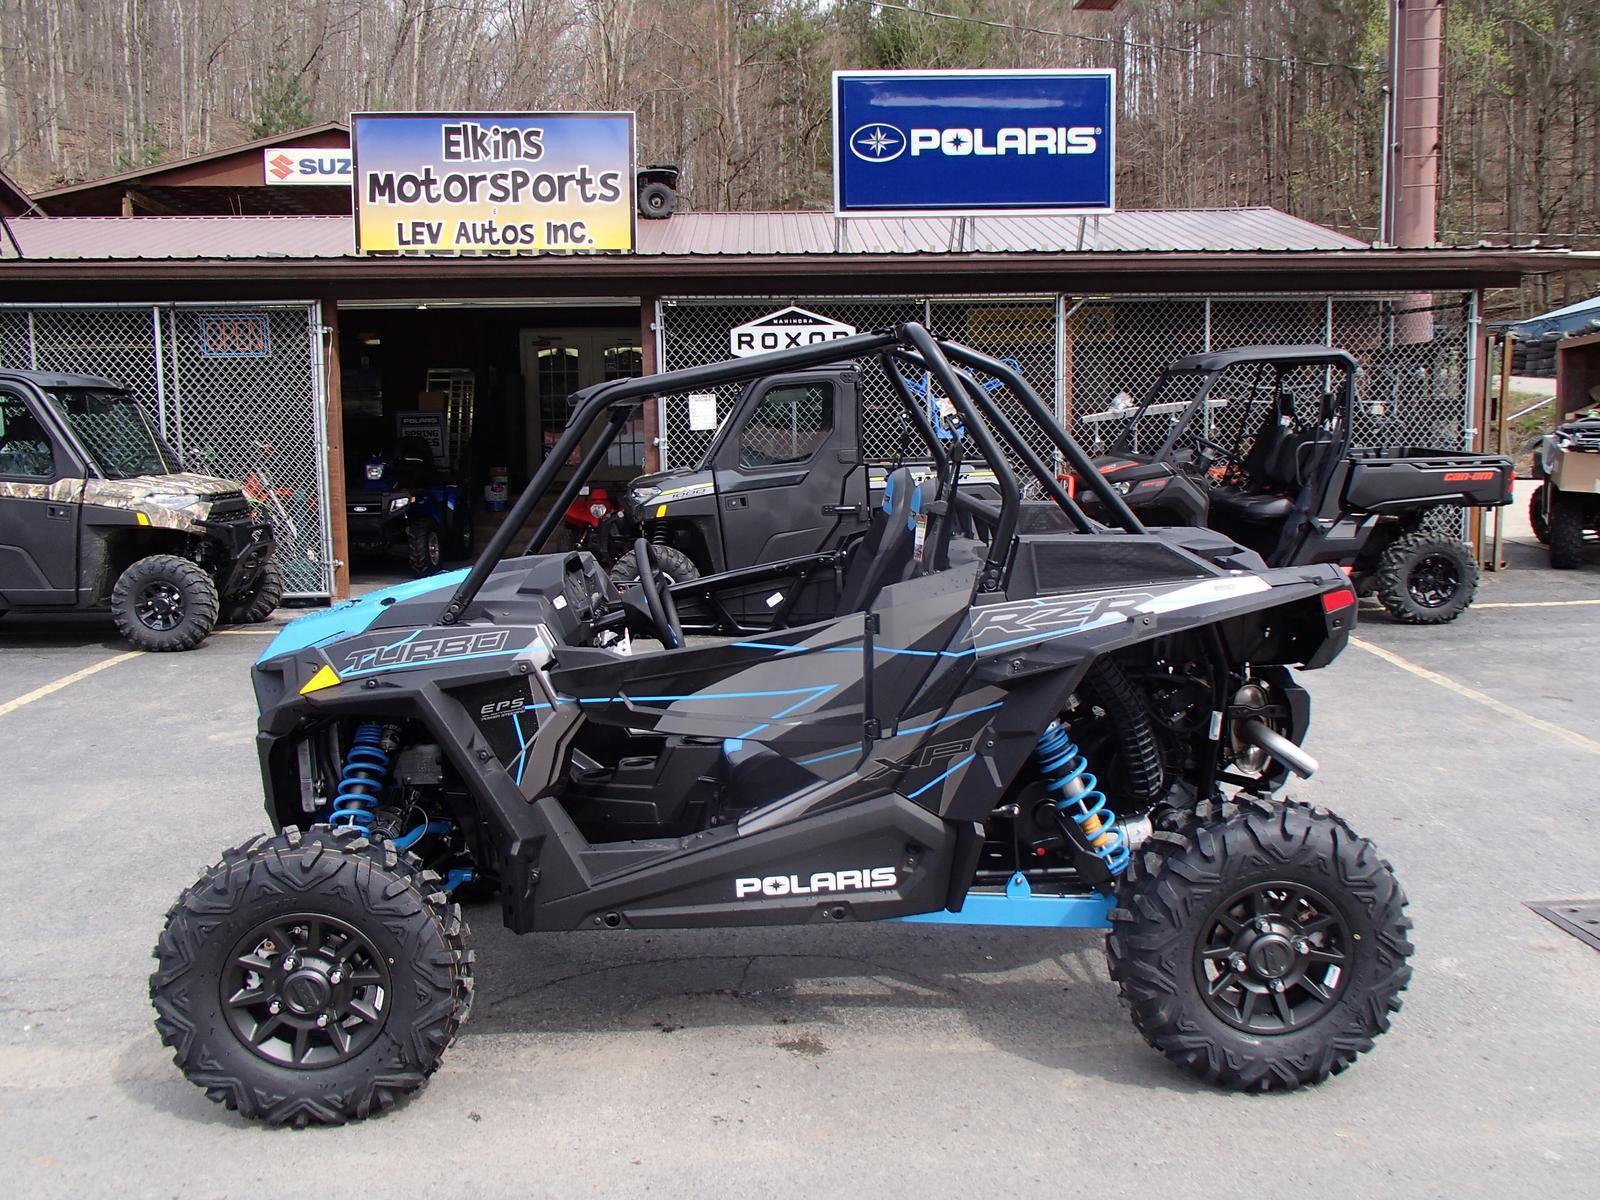 2019 Polaris Industries RZR XP 1000 Turbo